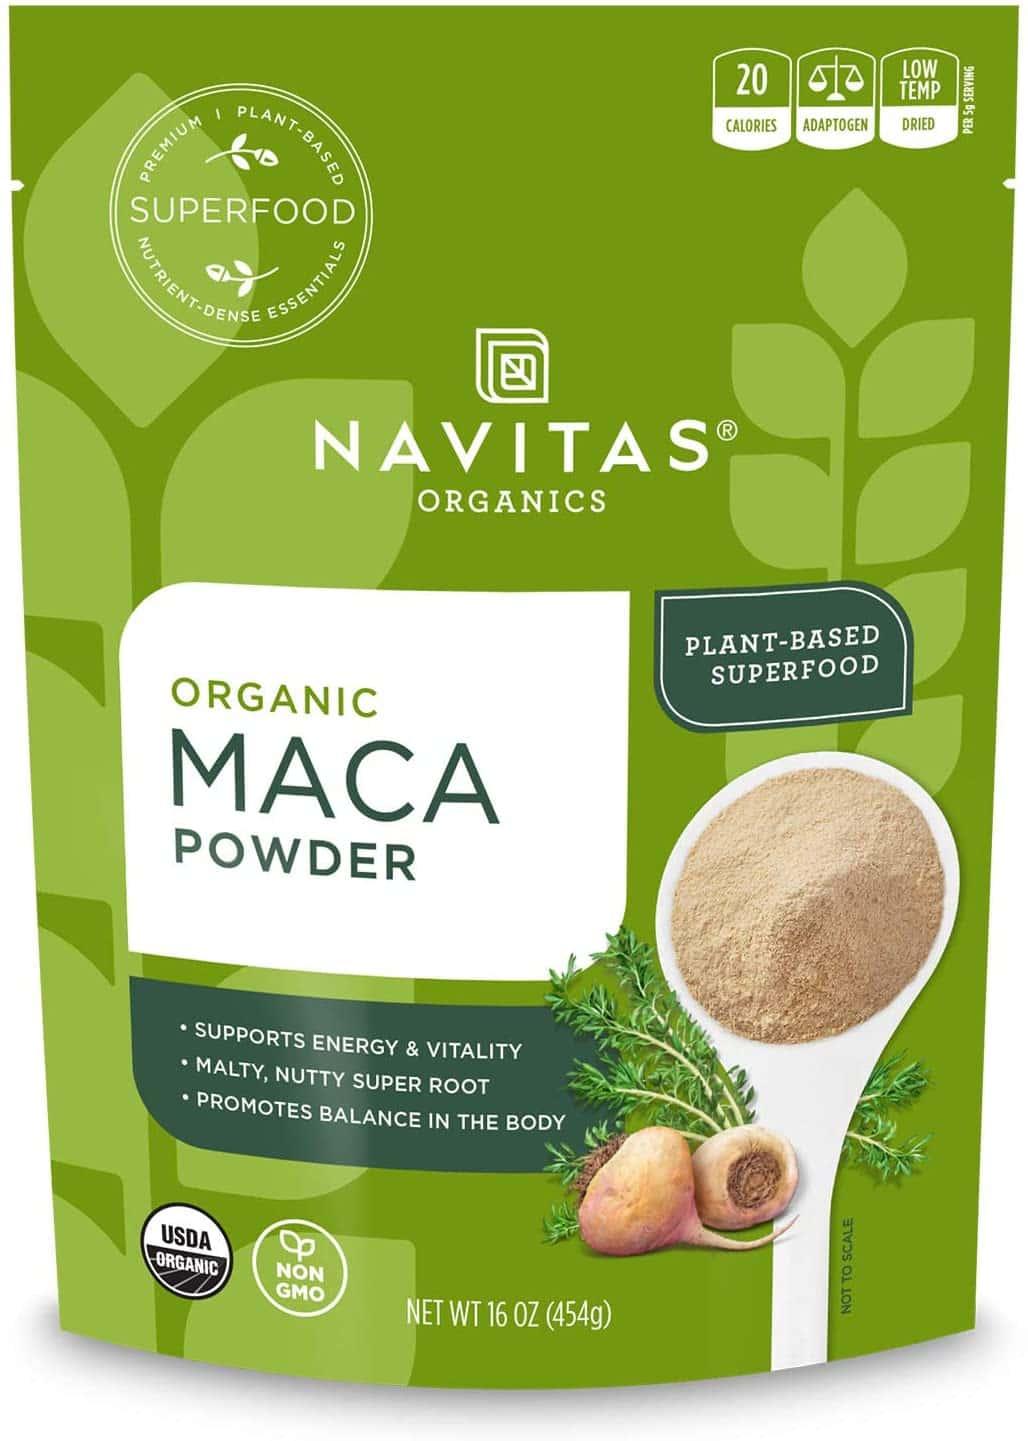 Navitas Organics Maca Powder